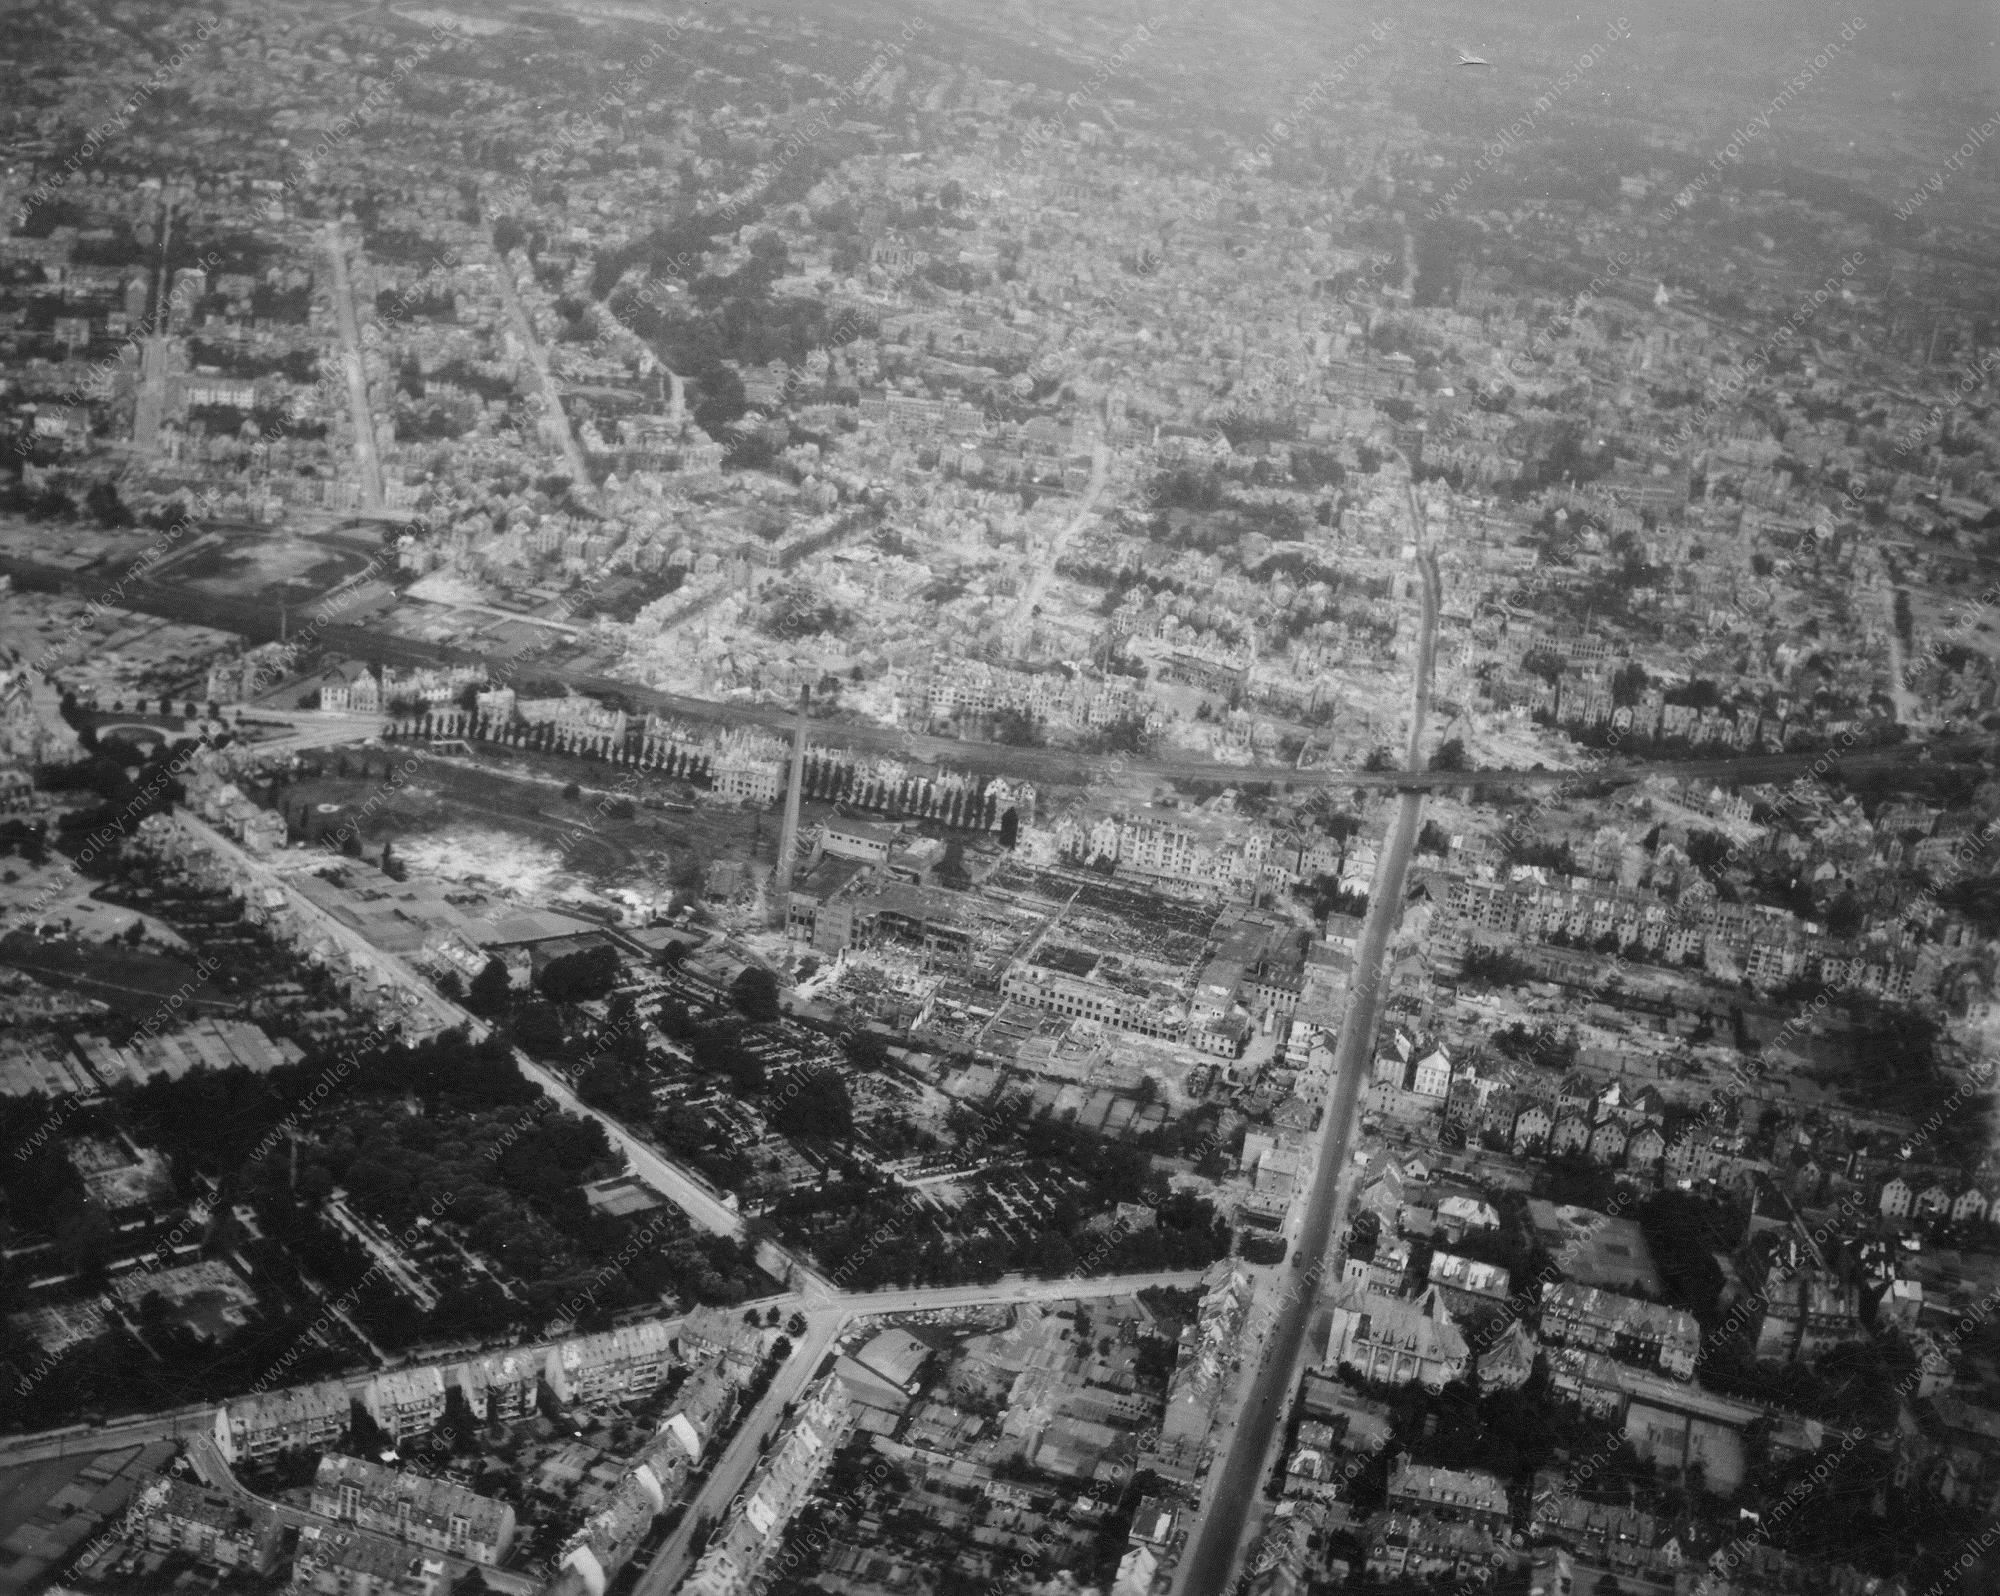 Osnabrück Luftbild im Mai 1945